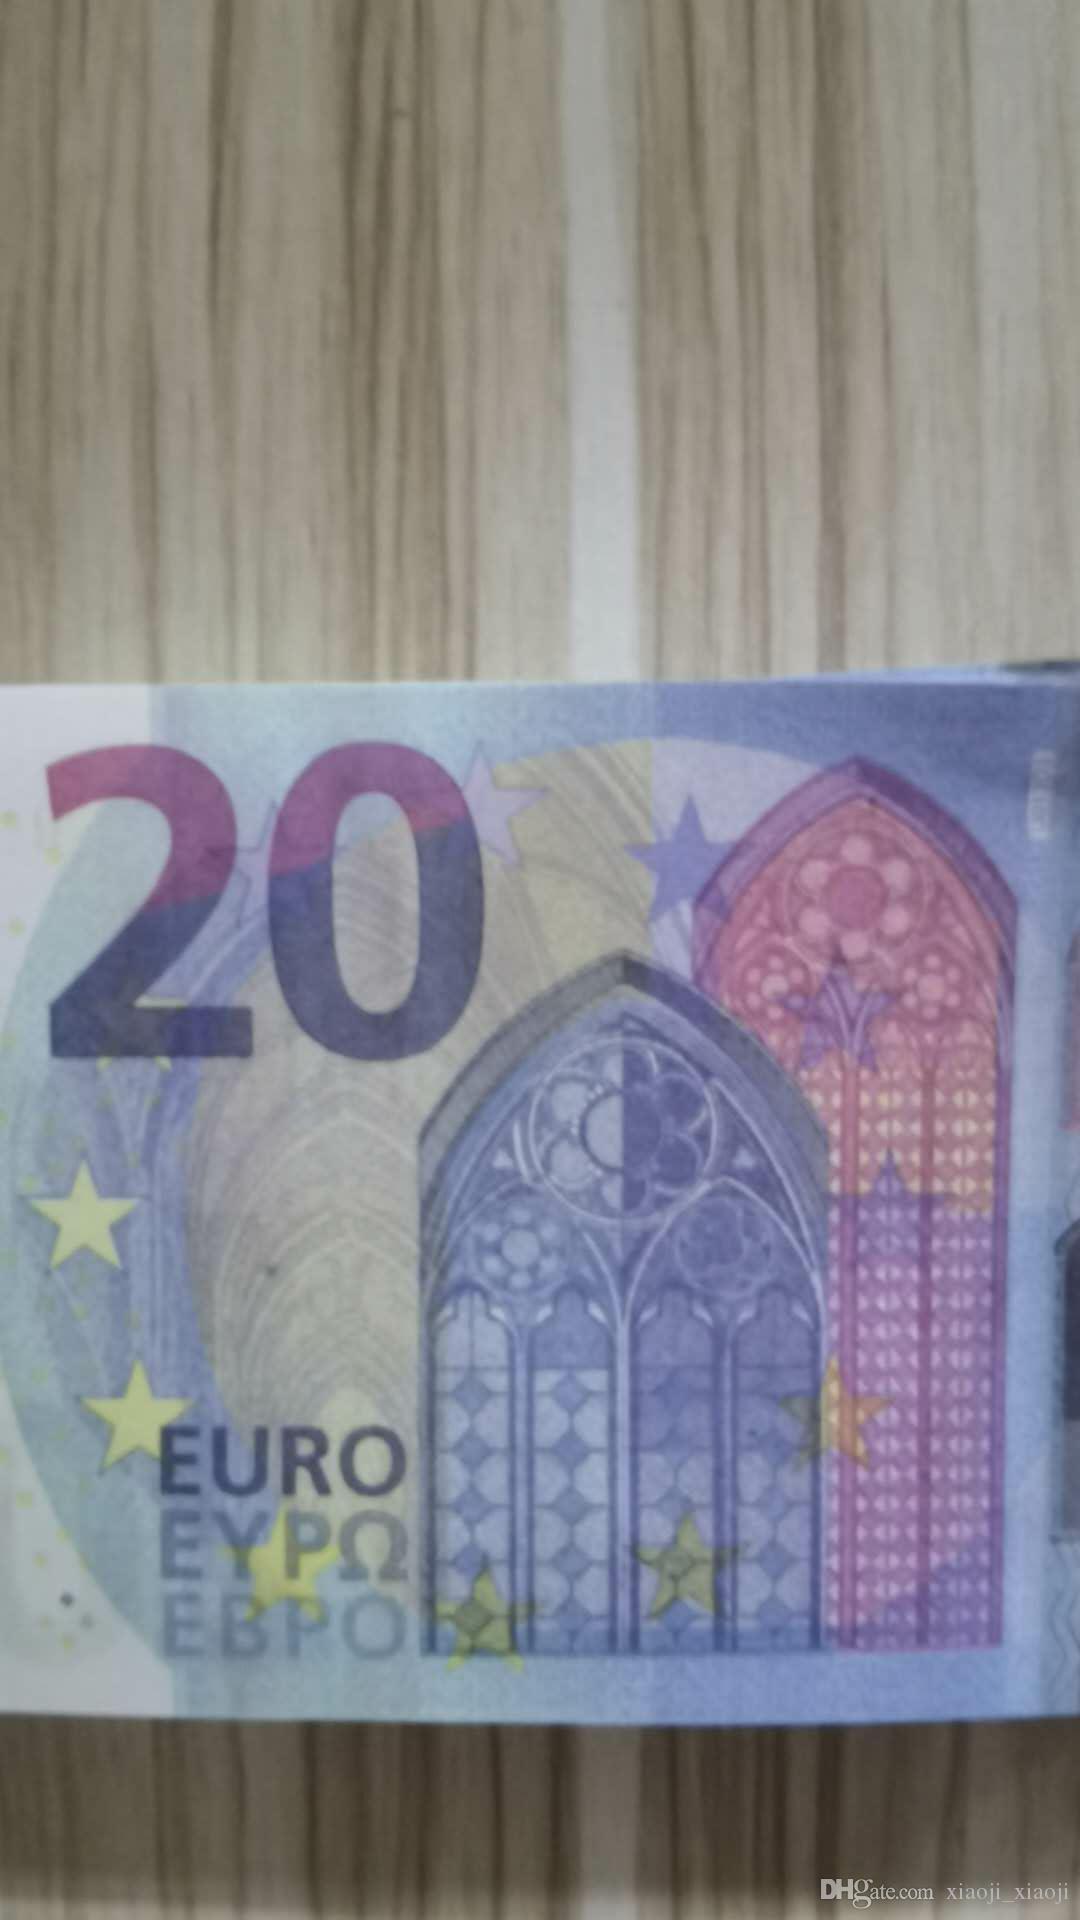 Banknote Bags Euro Fake Price Money Golds Gold 10/20/50 Got Paper Banknote / 100/200 / 500 евро Продажа предпринимательской банкноты копия 15 VIUQX